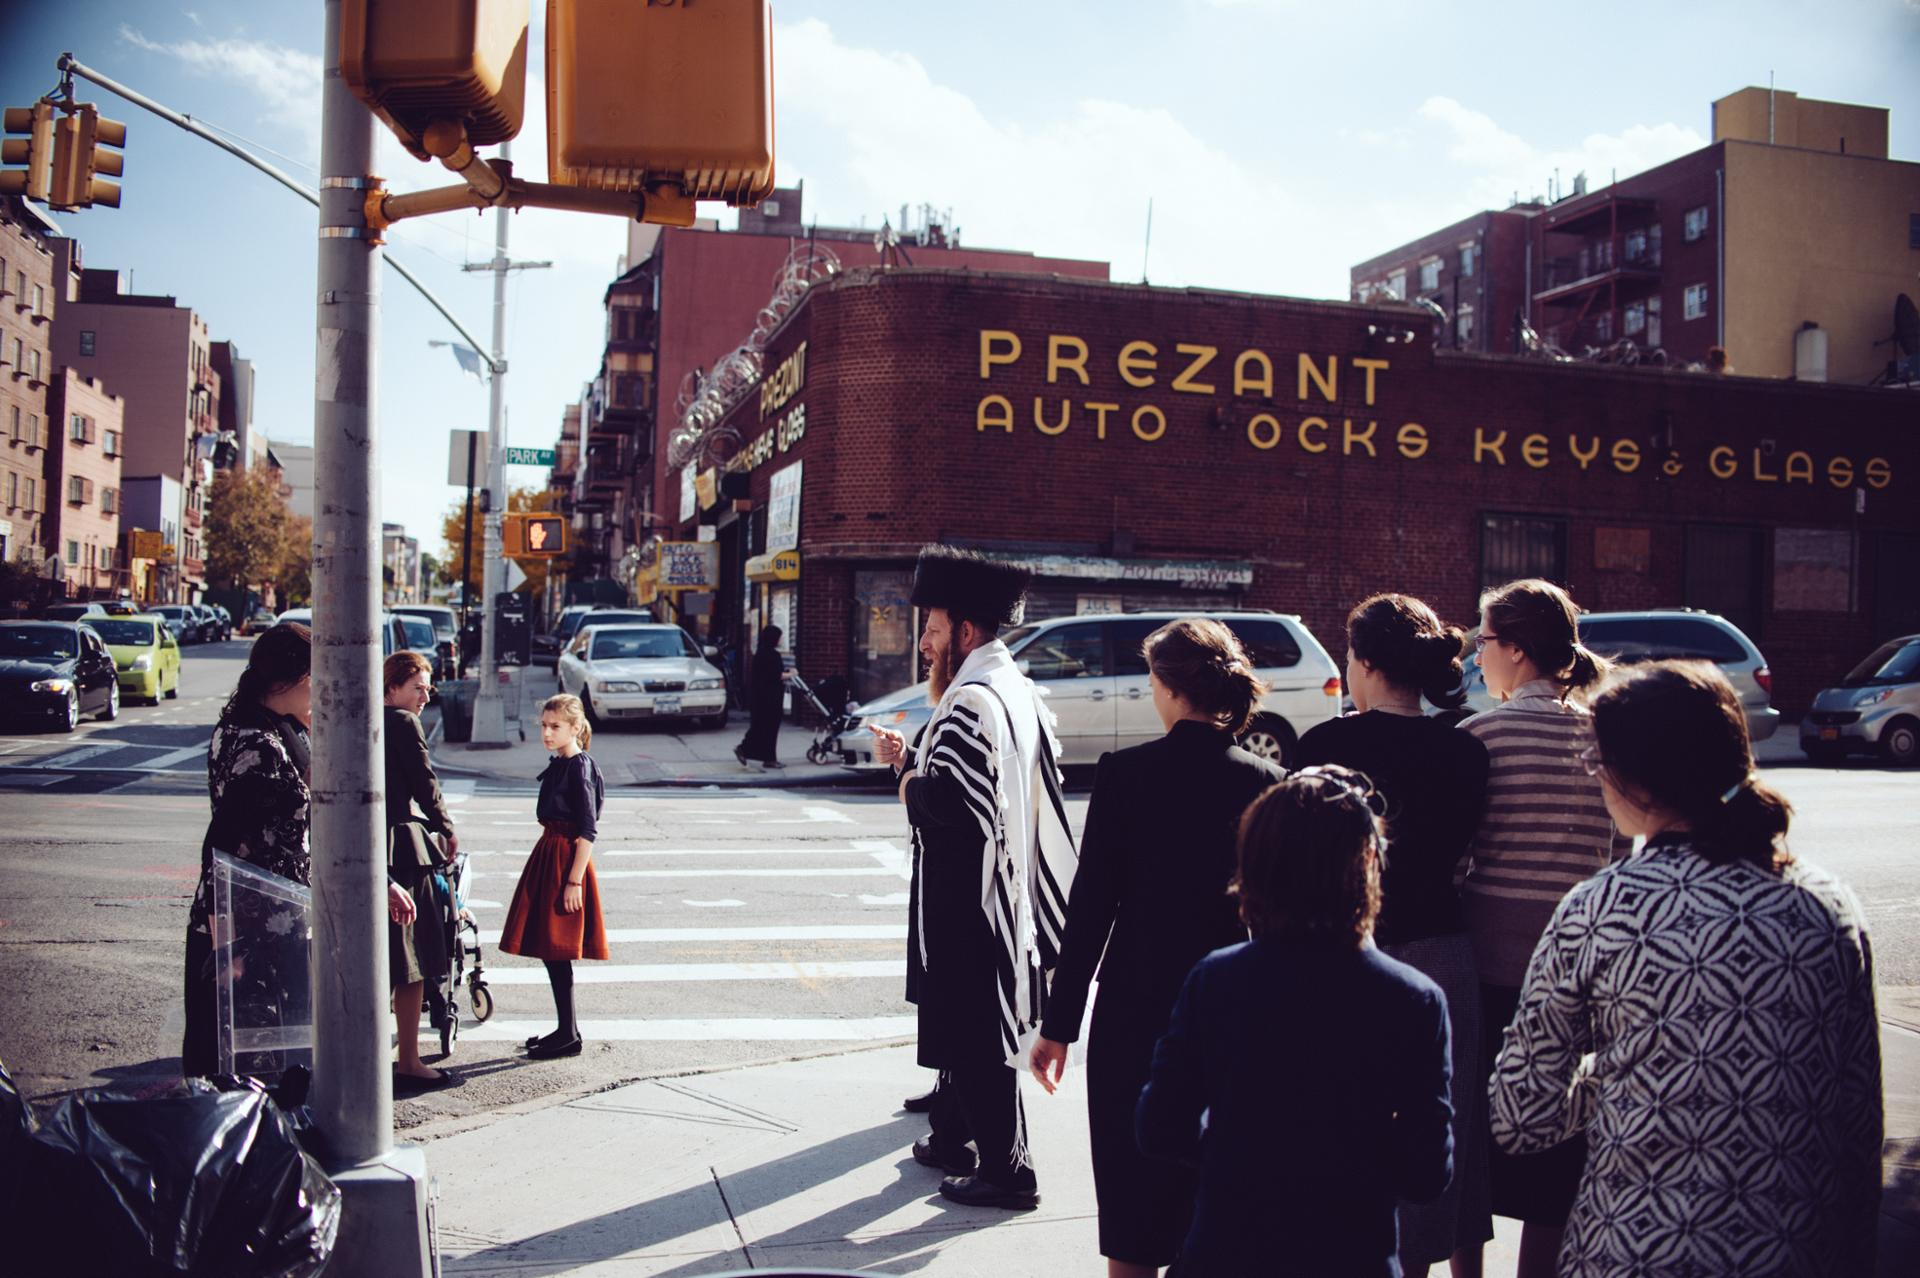 Beacon of light. Brooklyn 2014